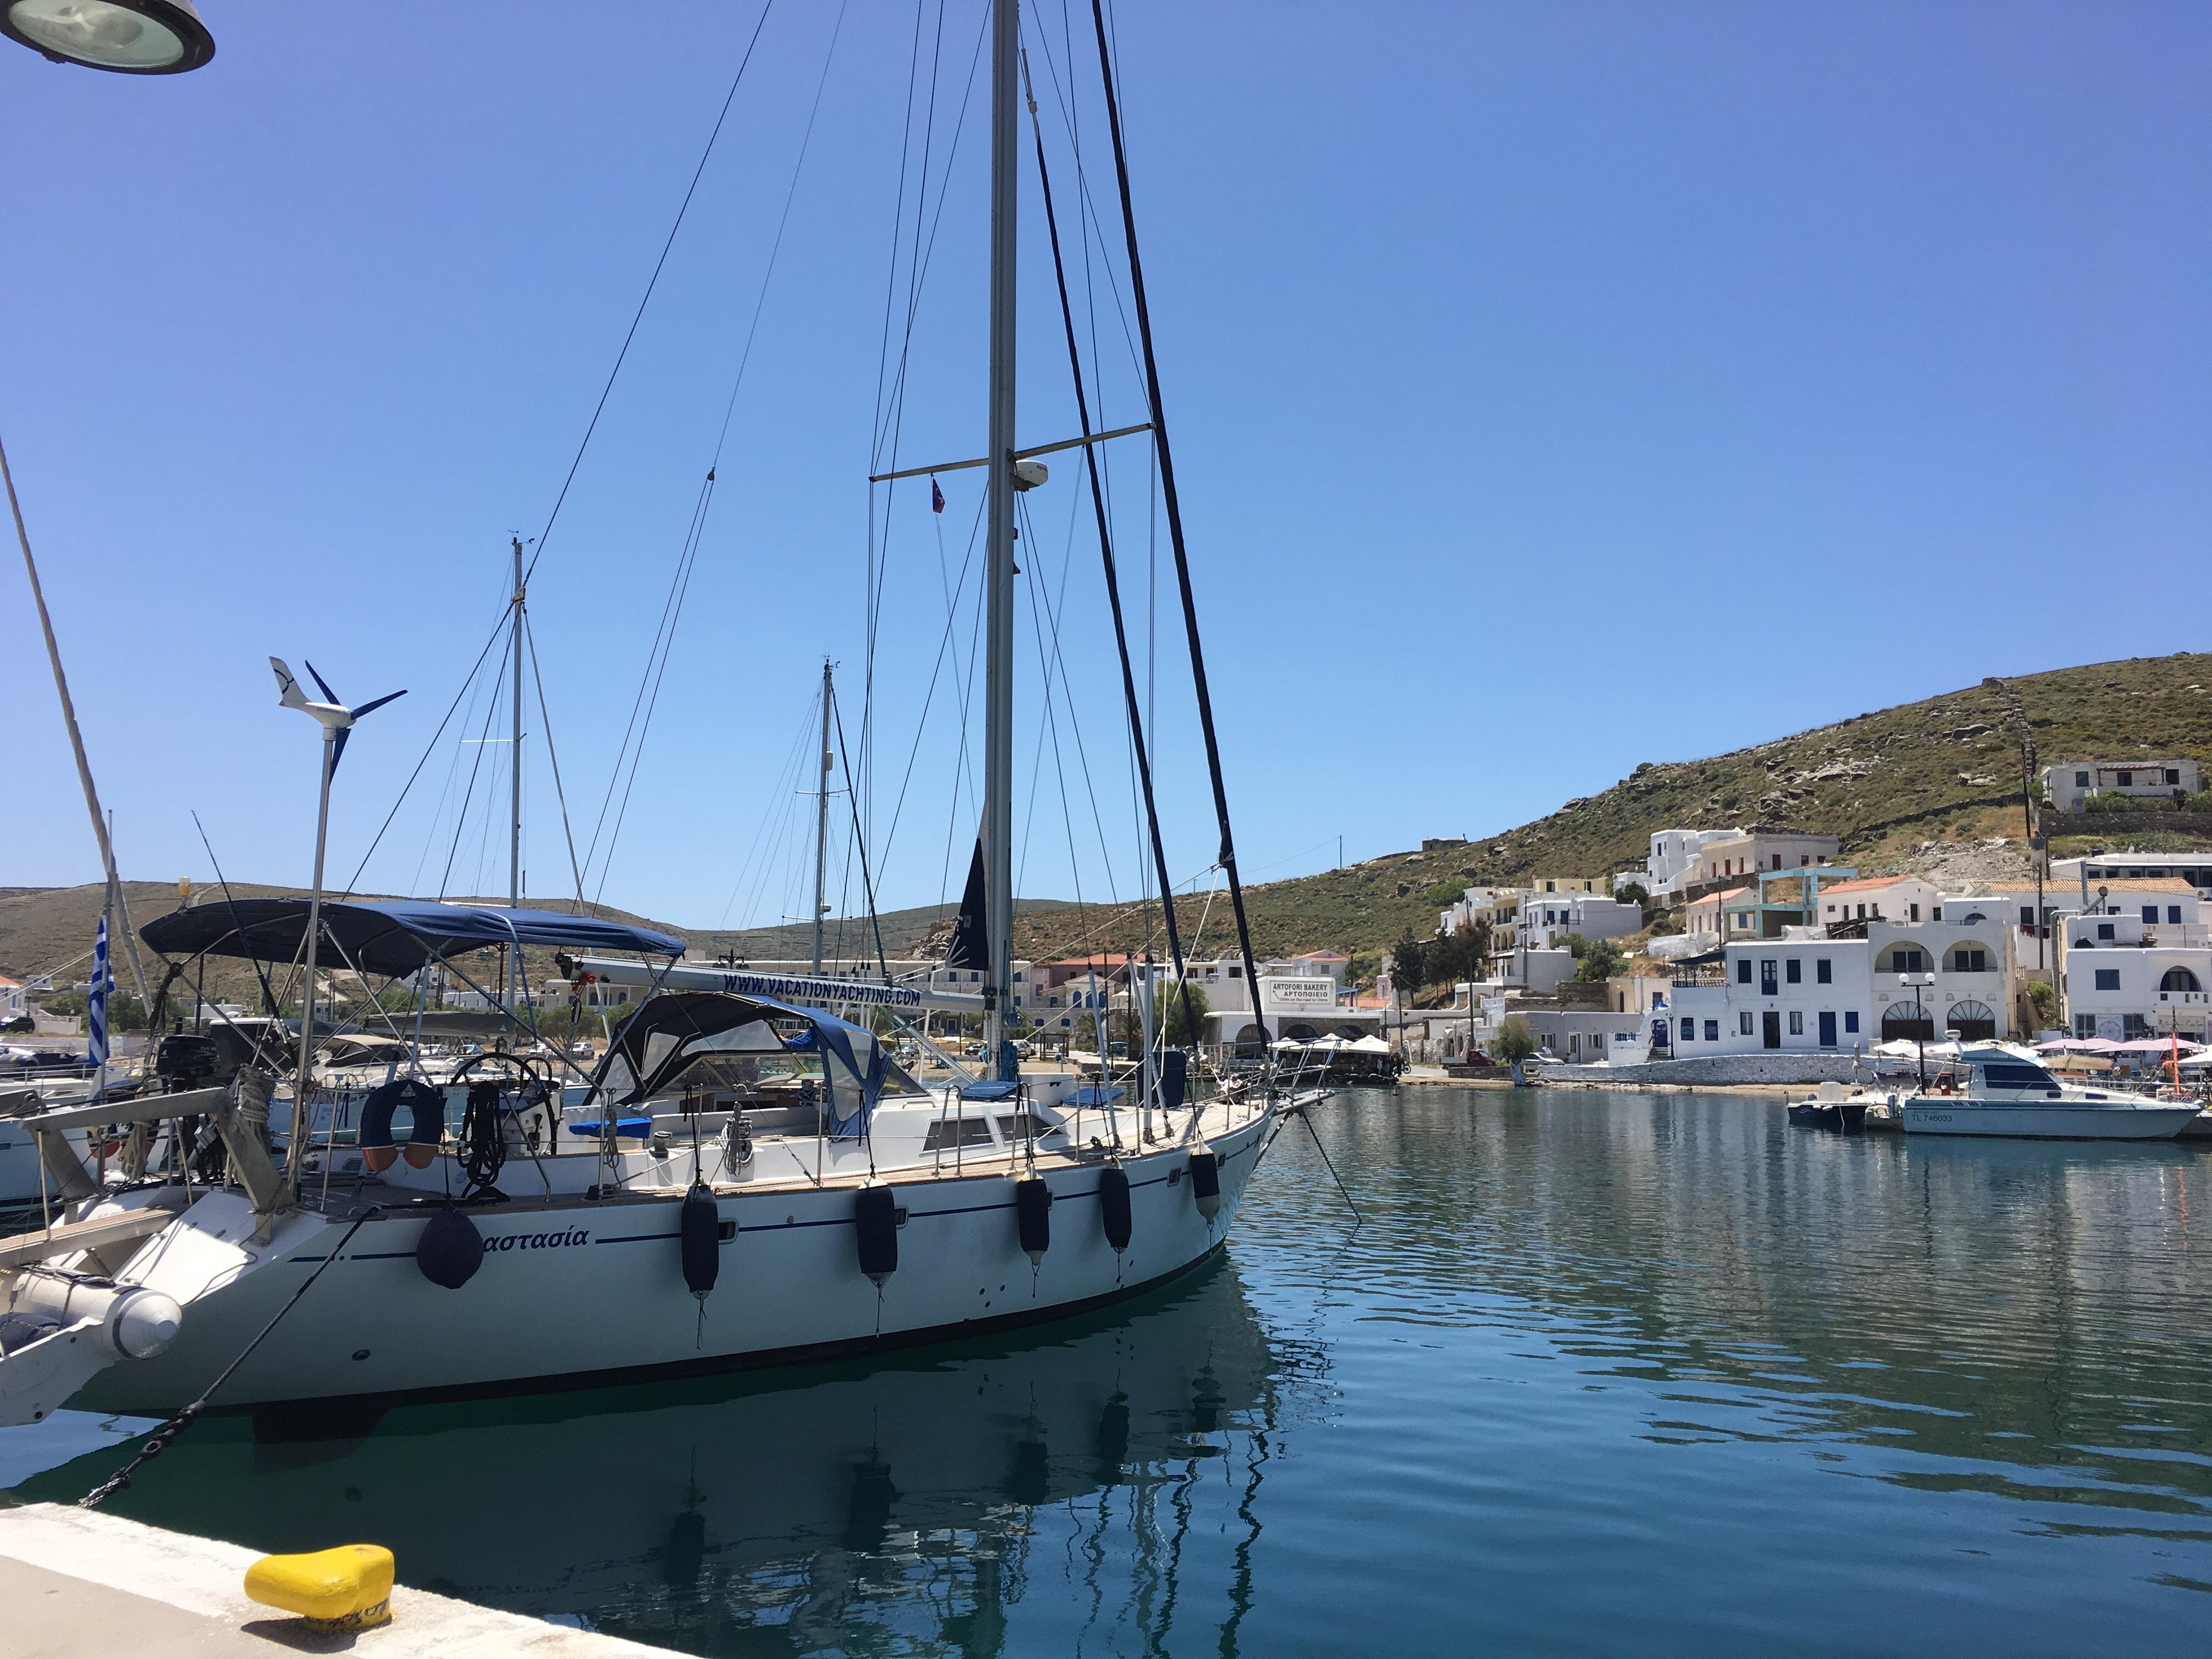 Greece, Mykonos. 61' sailing yacht